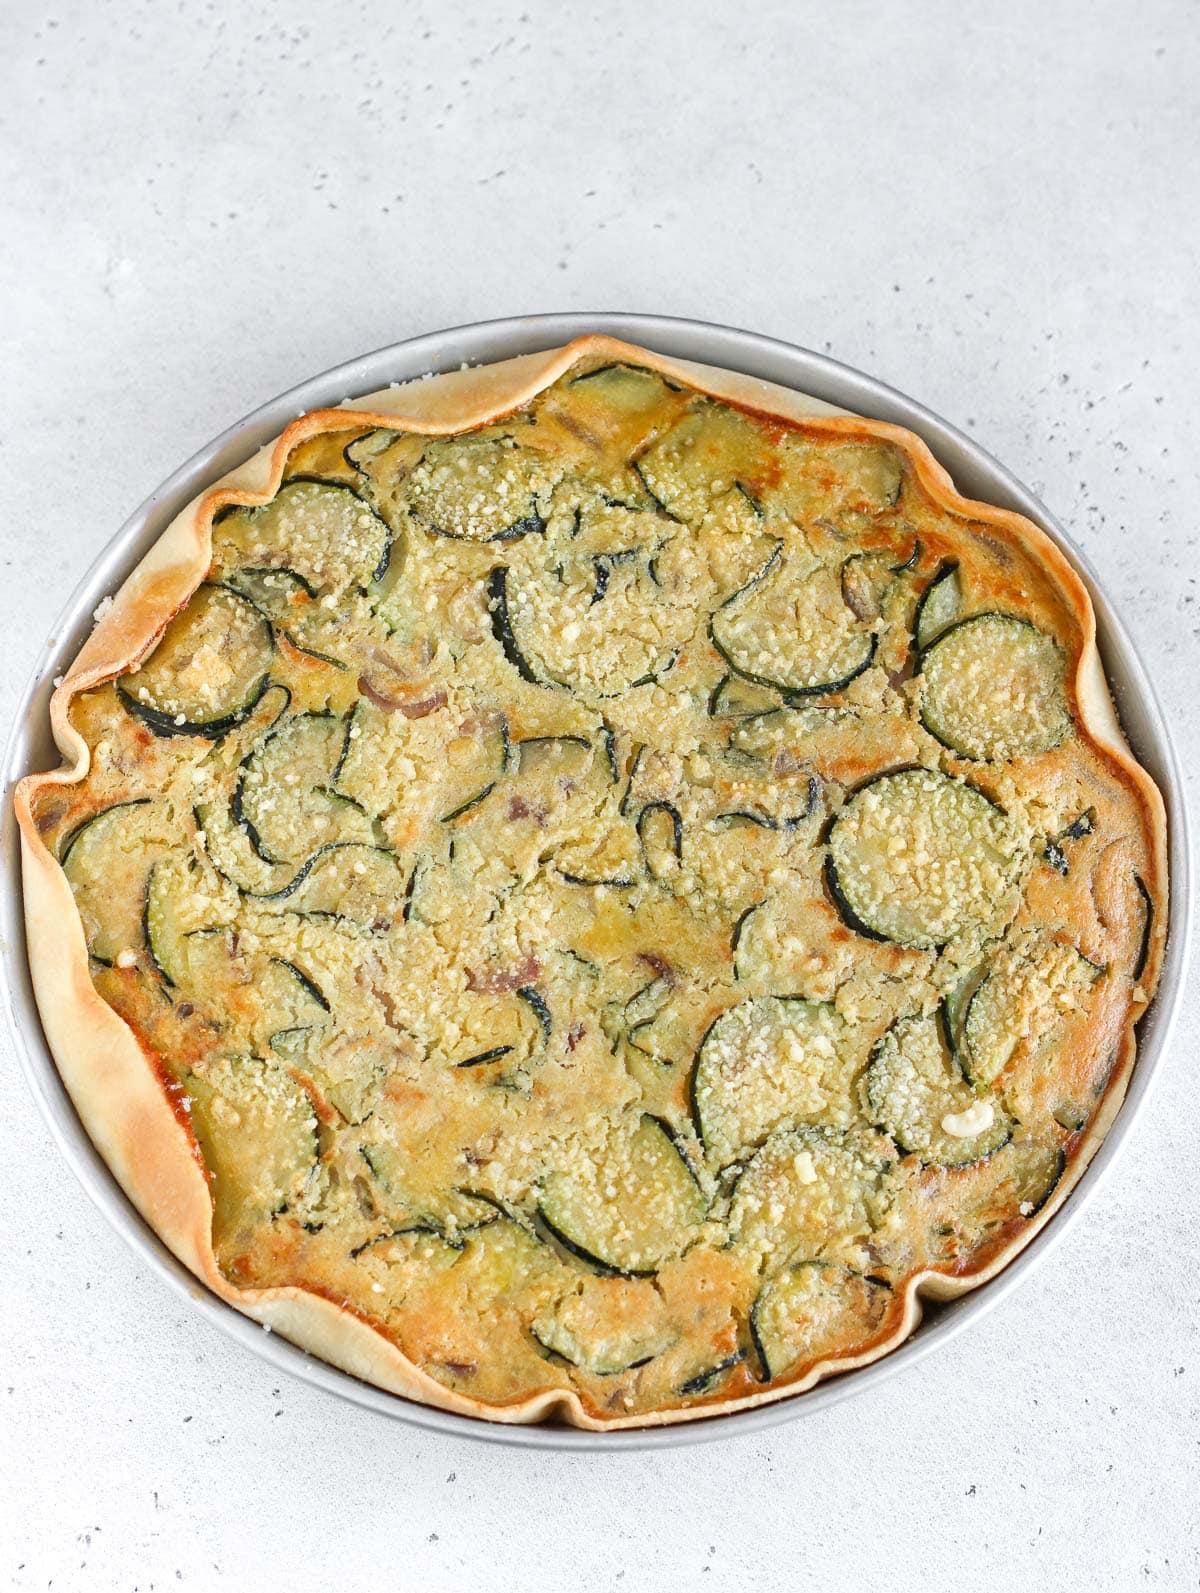 zucchini and onion pie